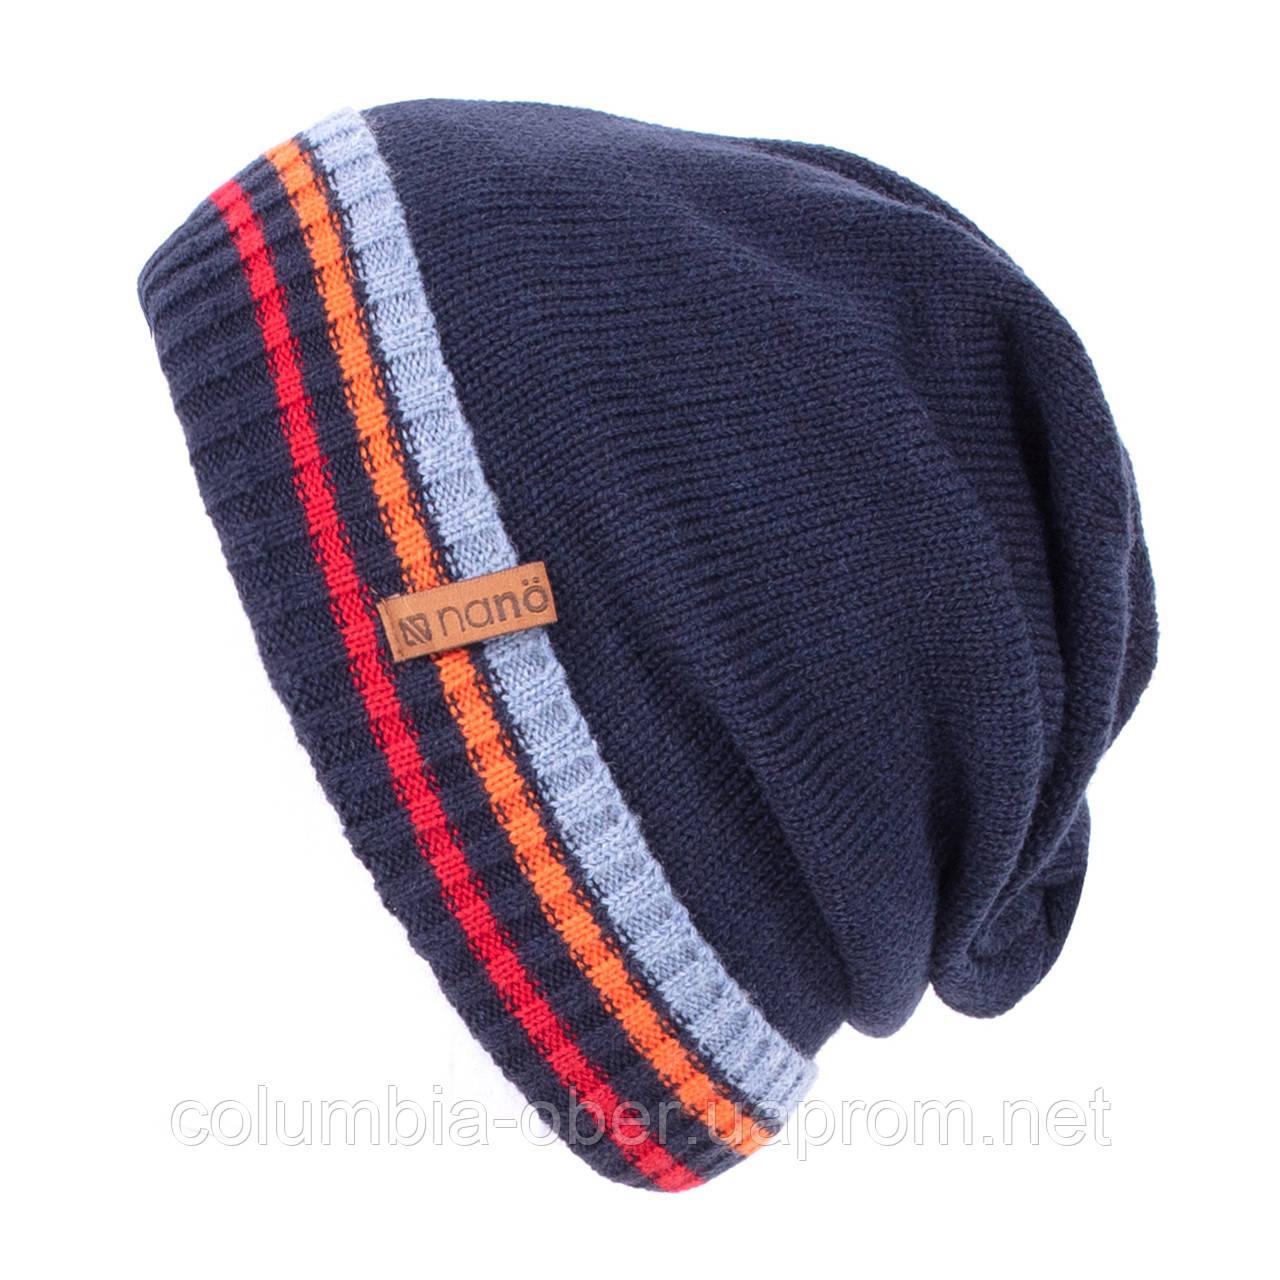 Зимняя шапка для мальчика Nano F19TU253 Marine/Orange. Размер 7/12.